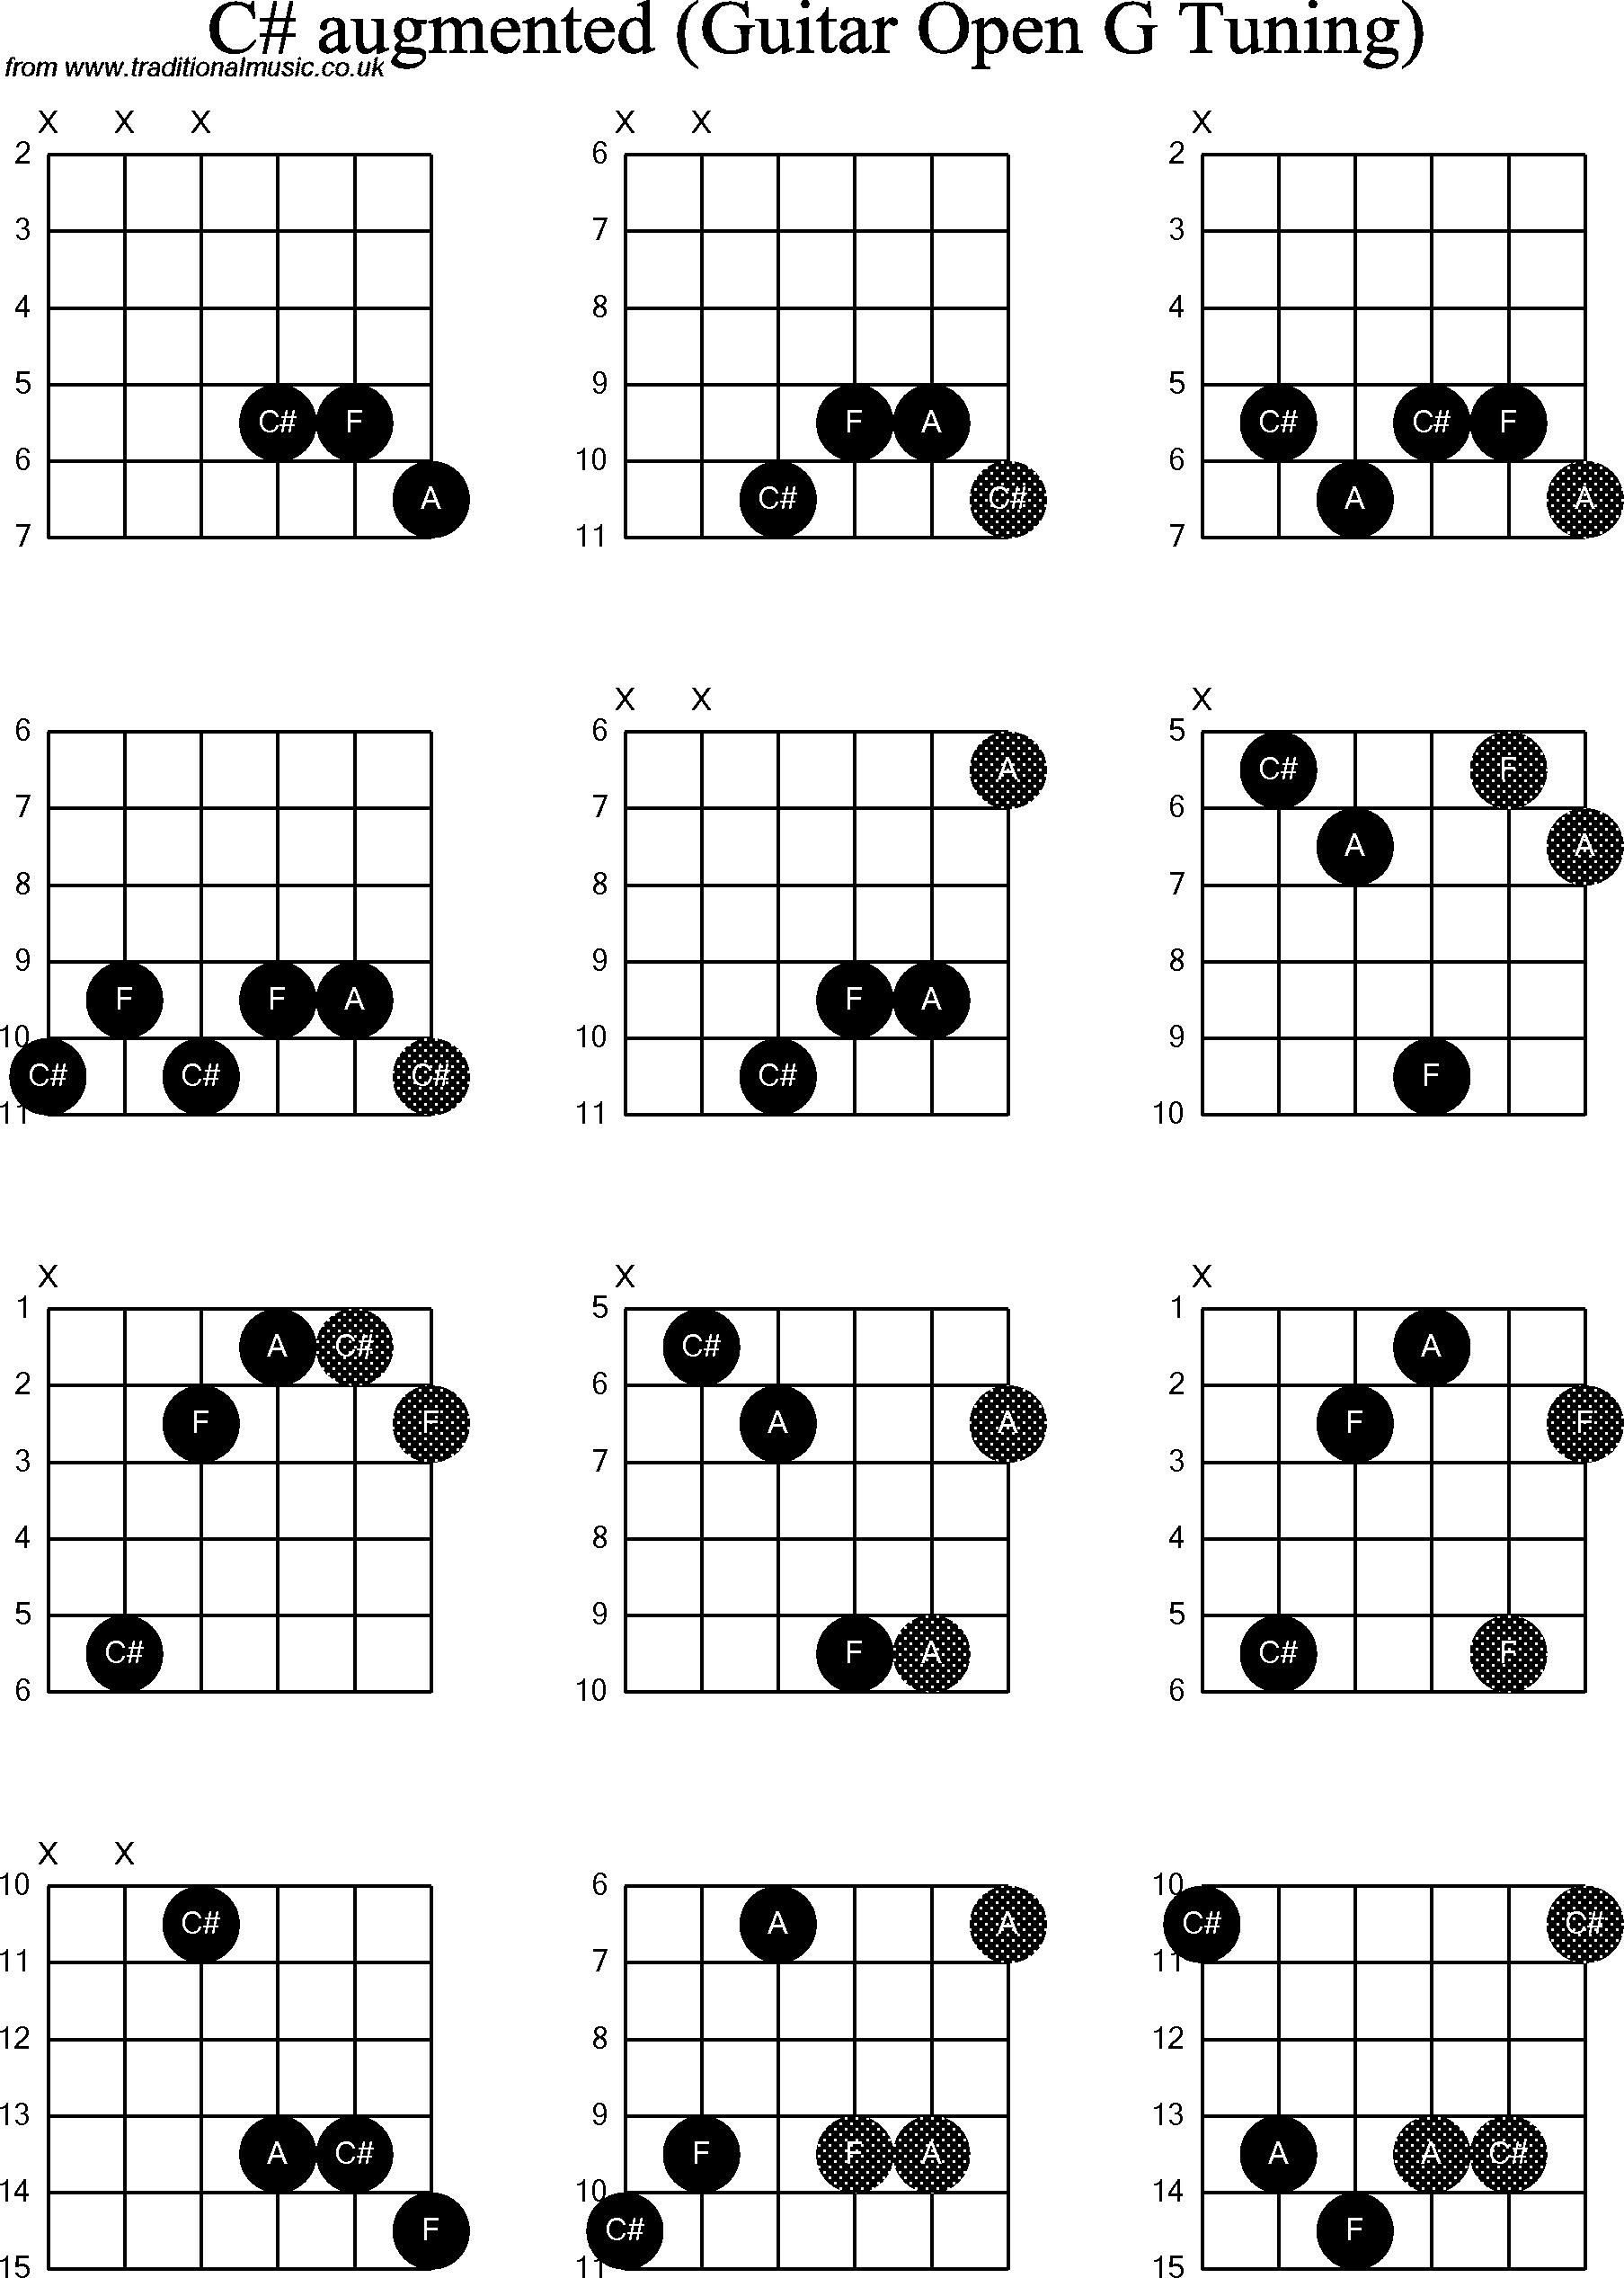 Chord diagrams for: Dobro C# Augmented